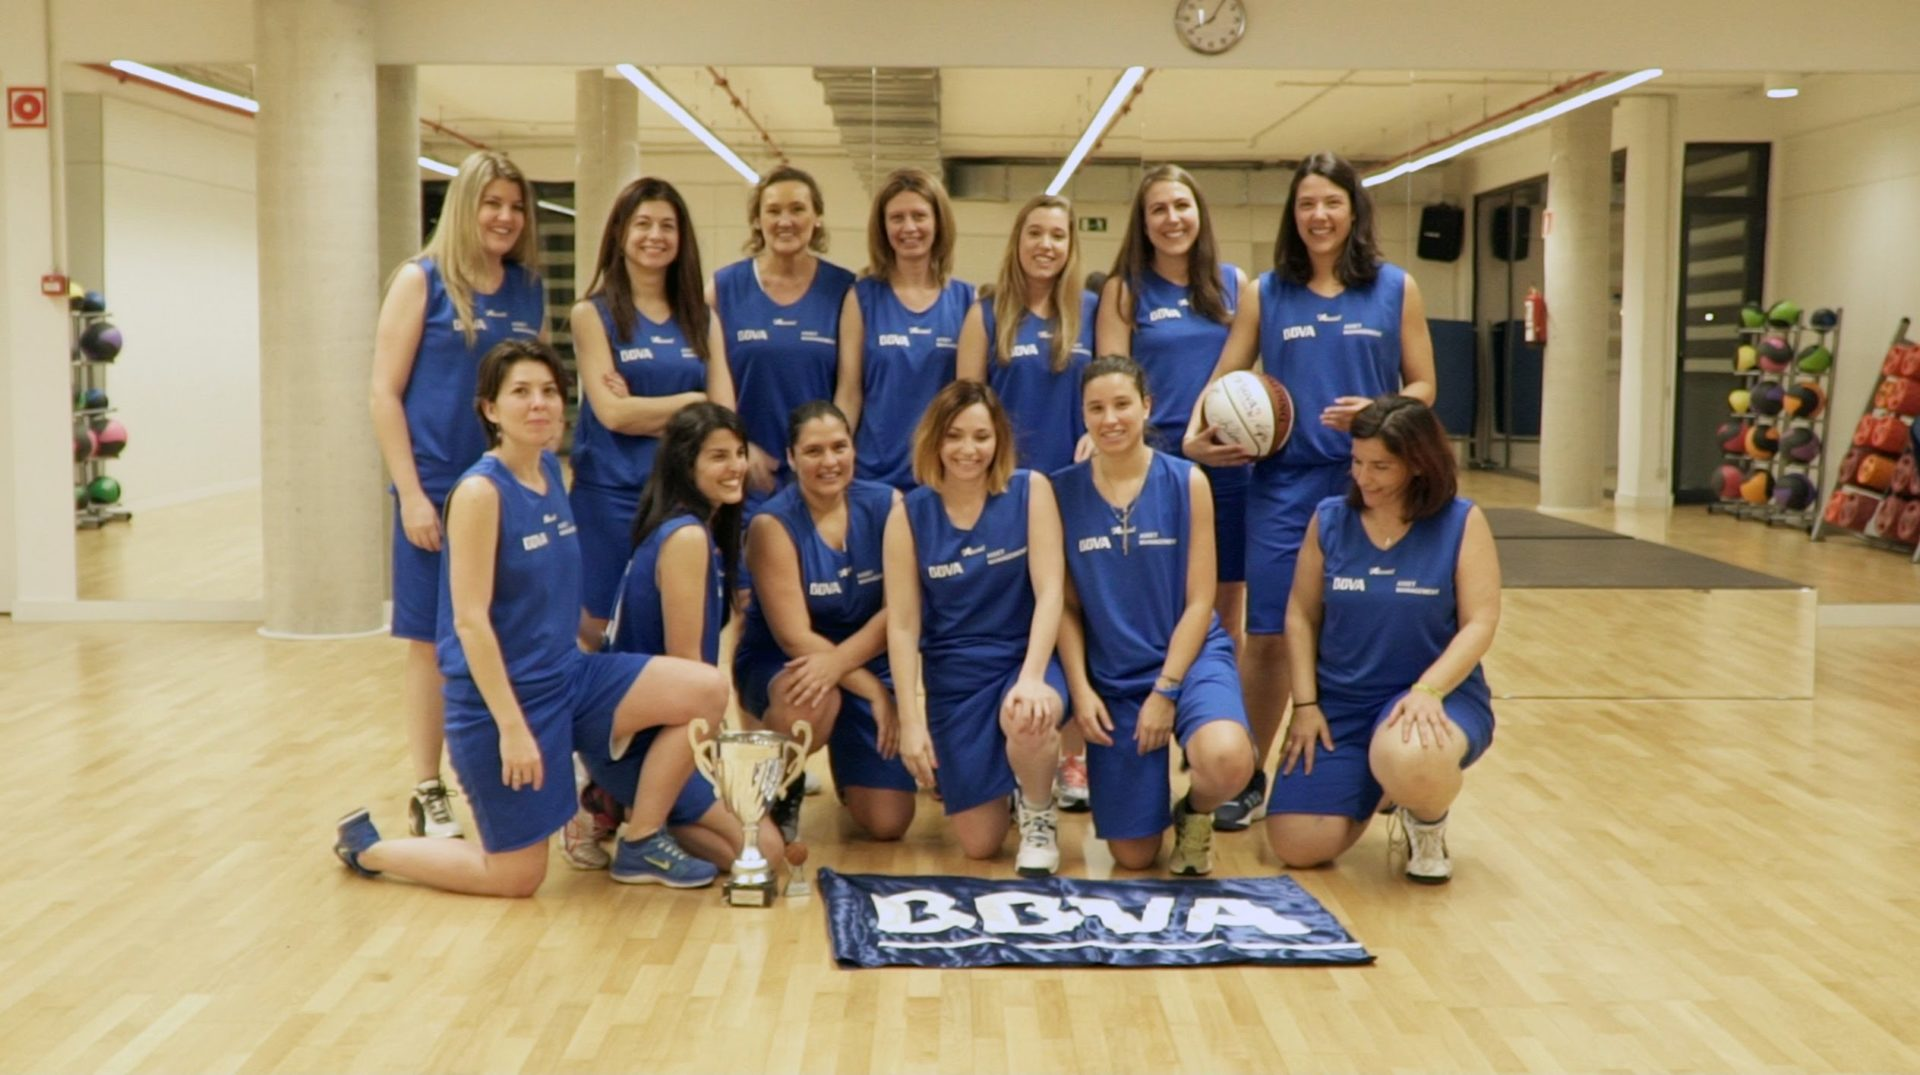 embajadores-bbva-baloncesto